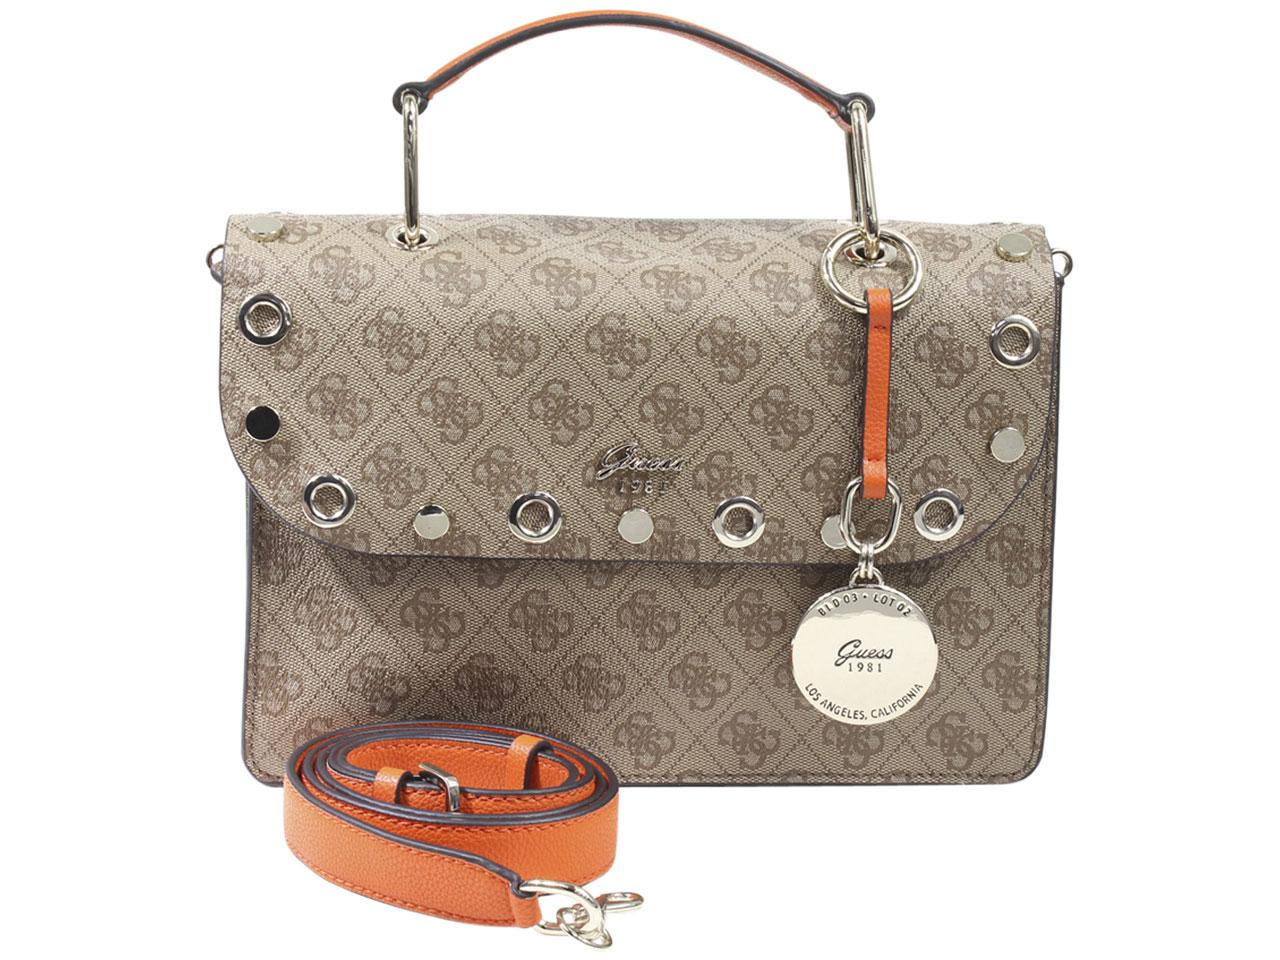 Guess Women s Jacqui Monogram Grommet Satchel Handbag 0dd203dd11f79